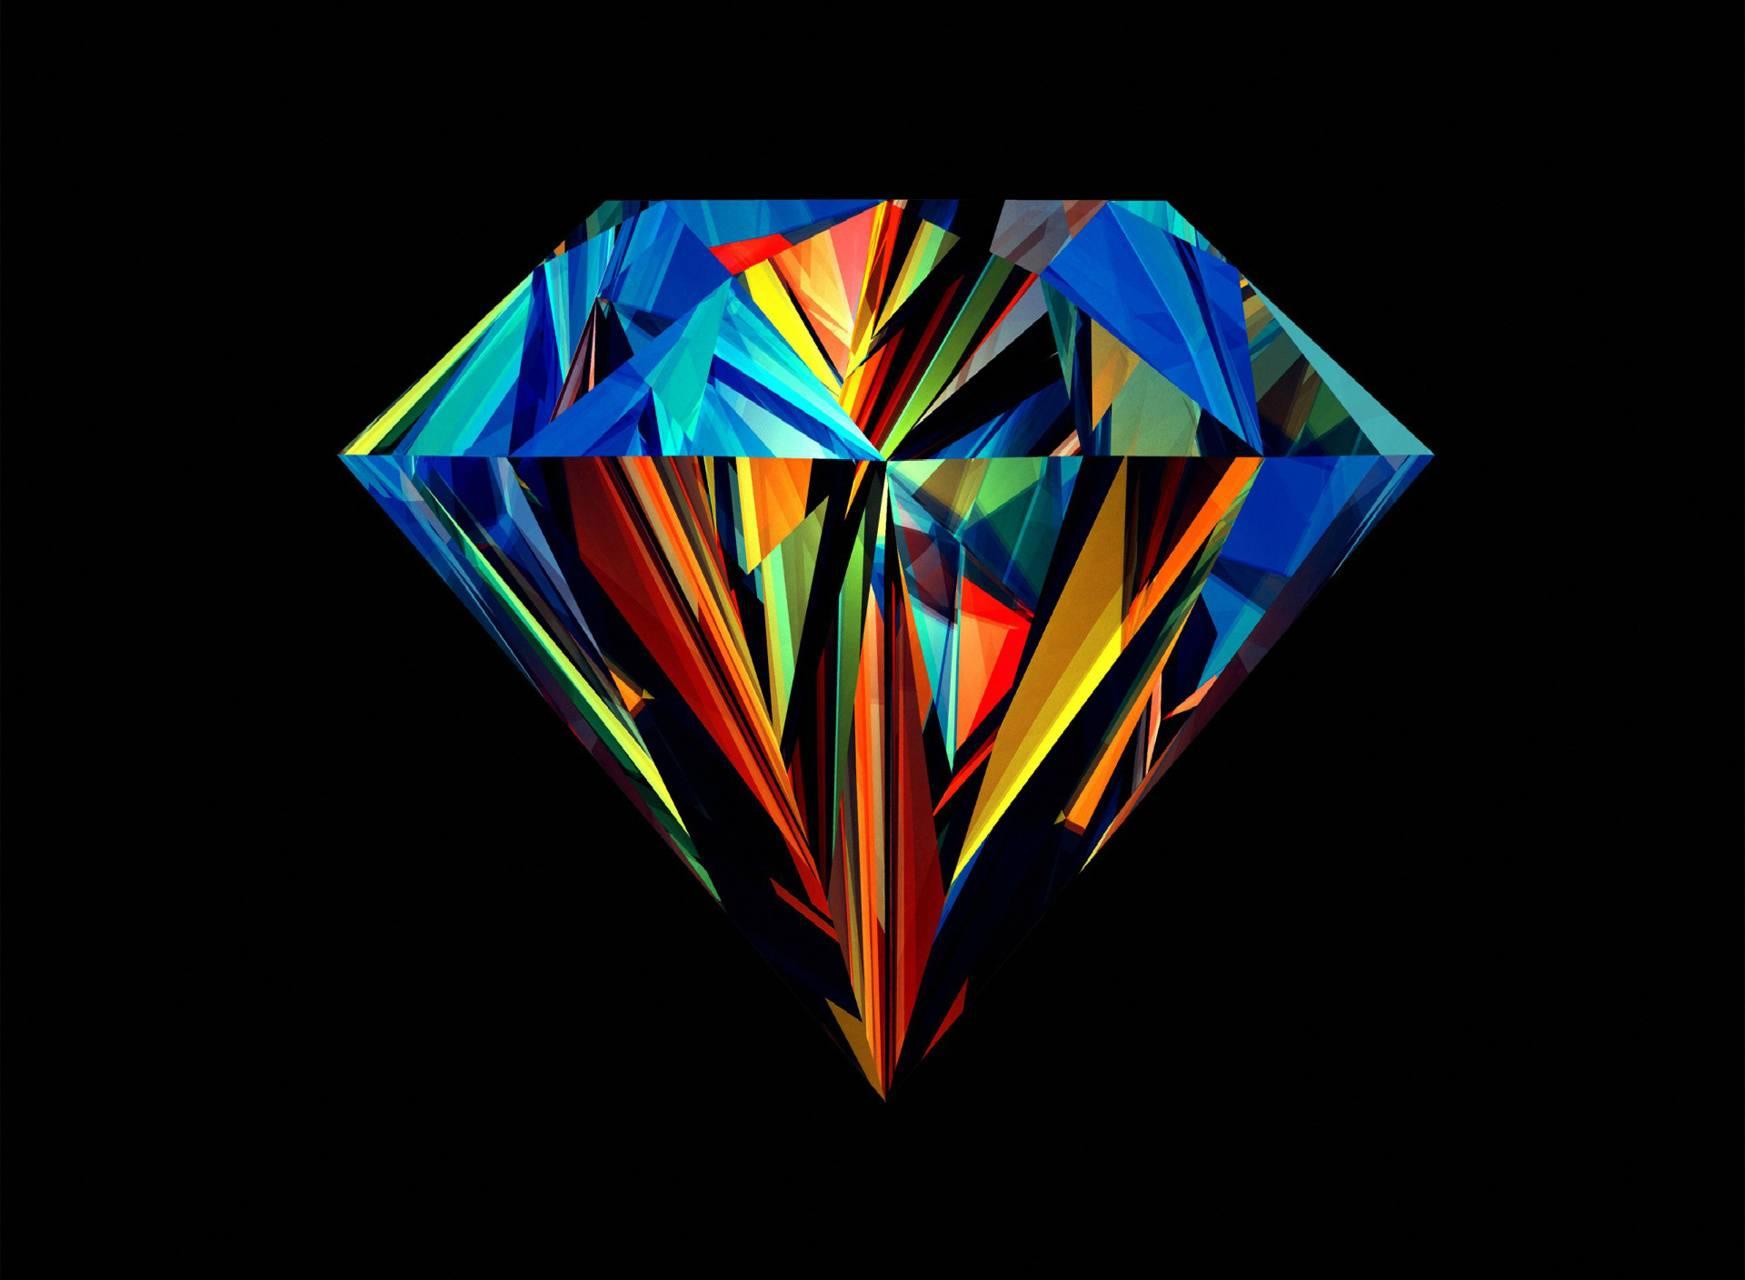 hd colorful diamond